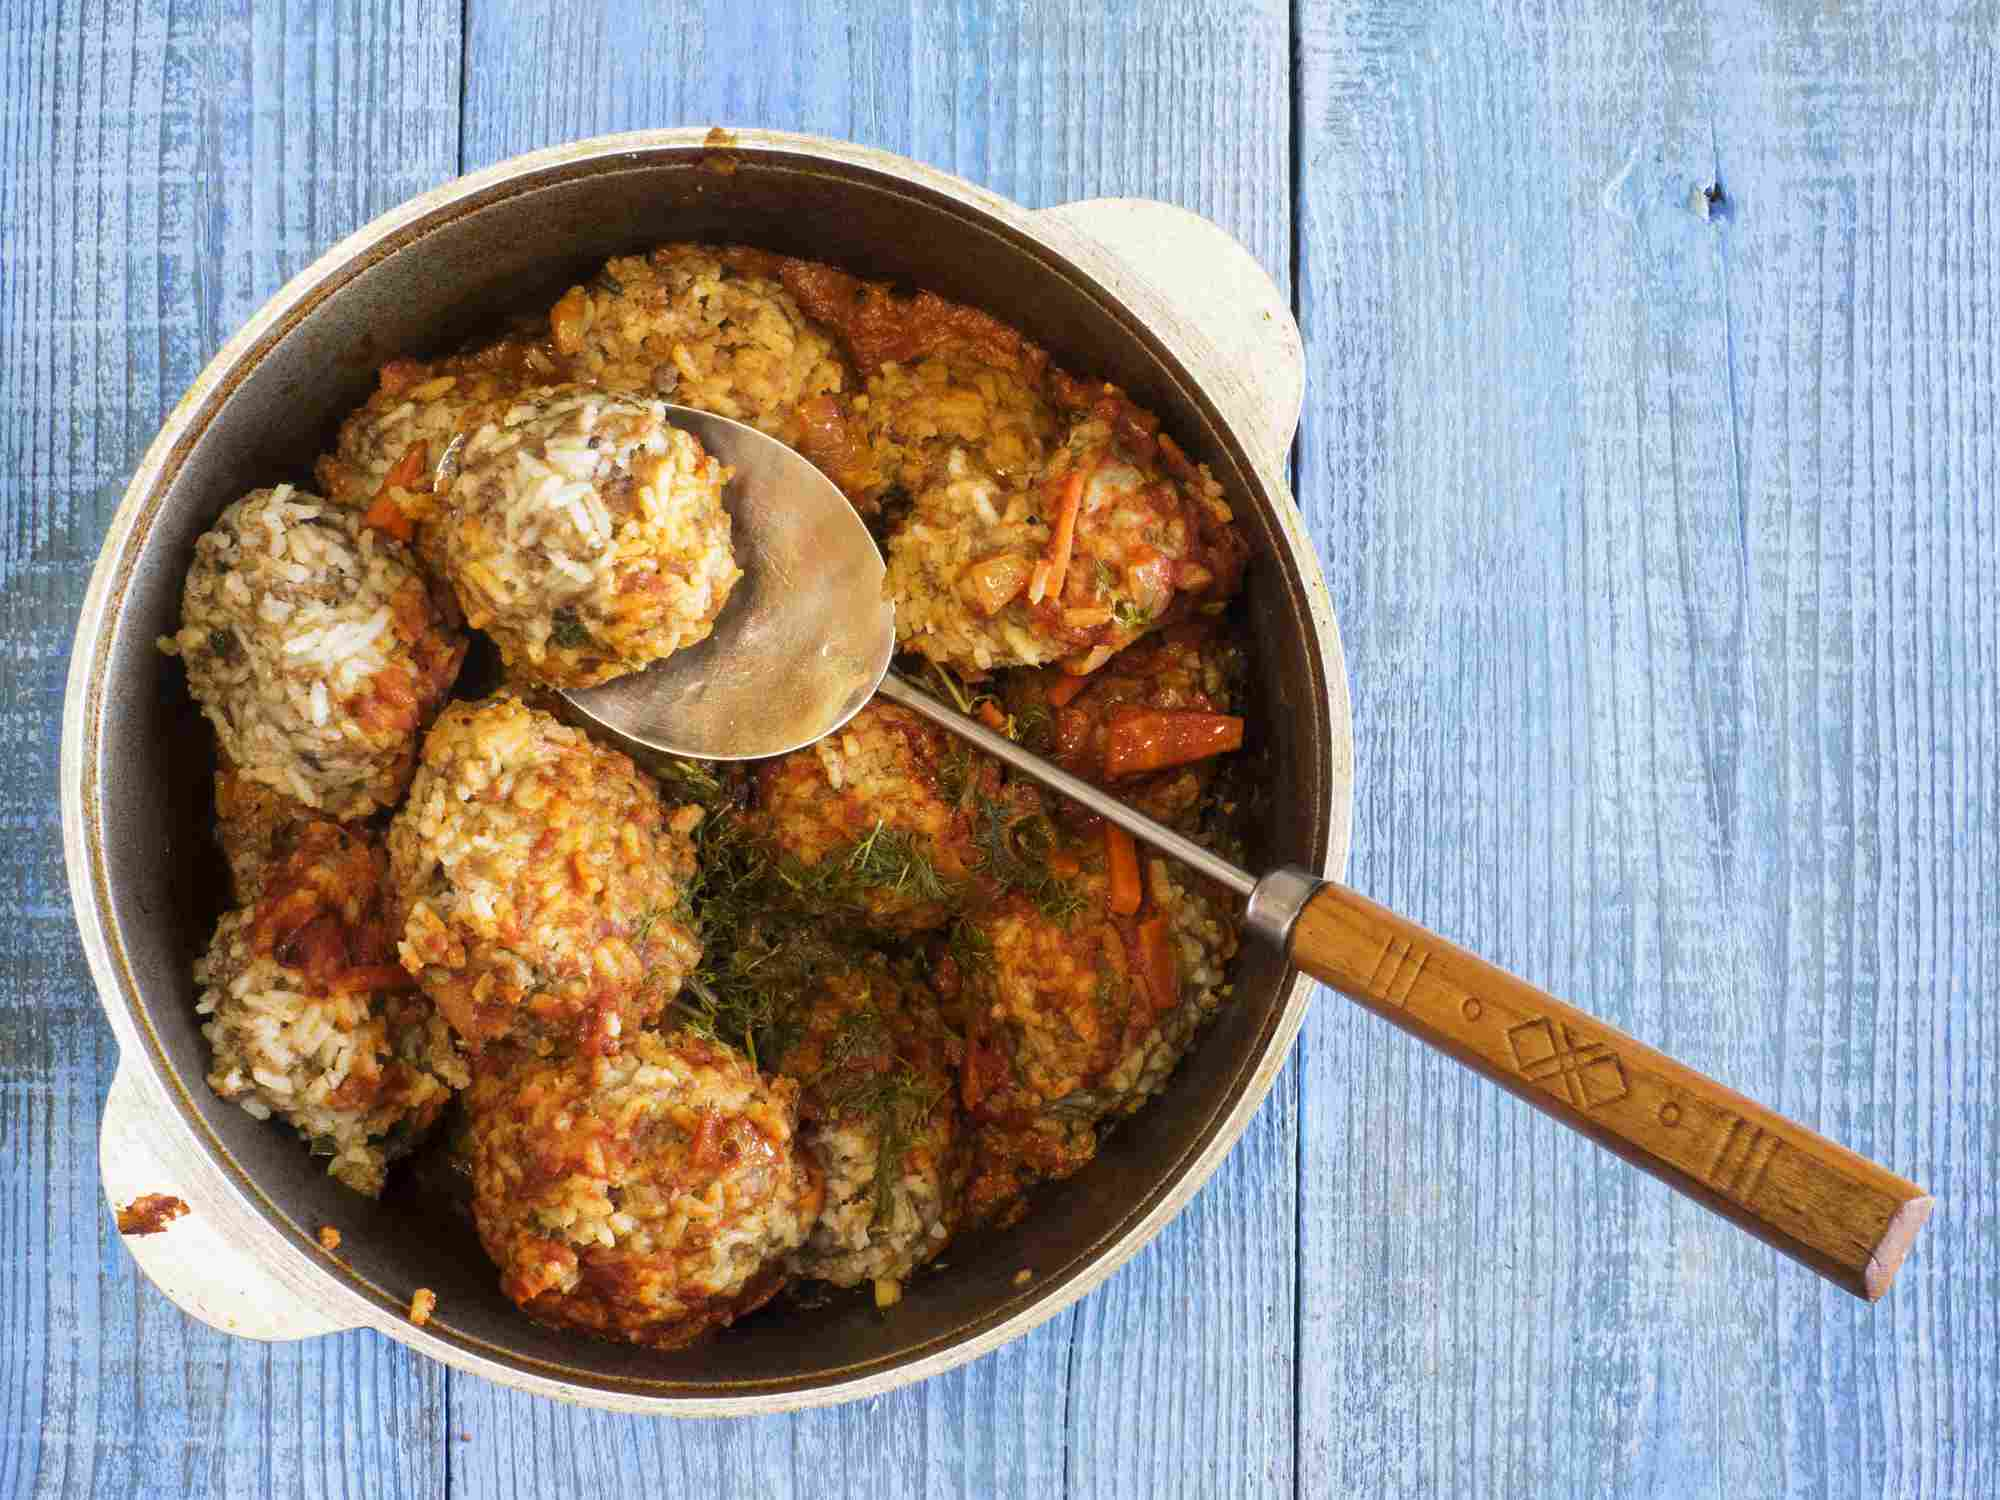 Meatballs in tomato sauce in saucepan